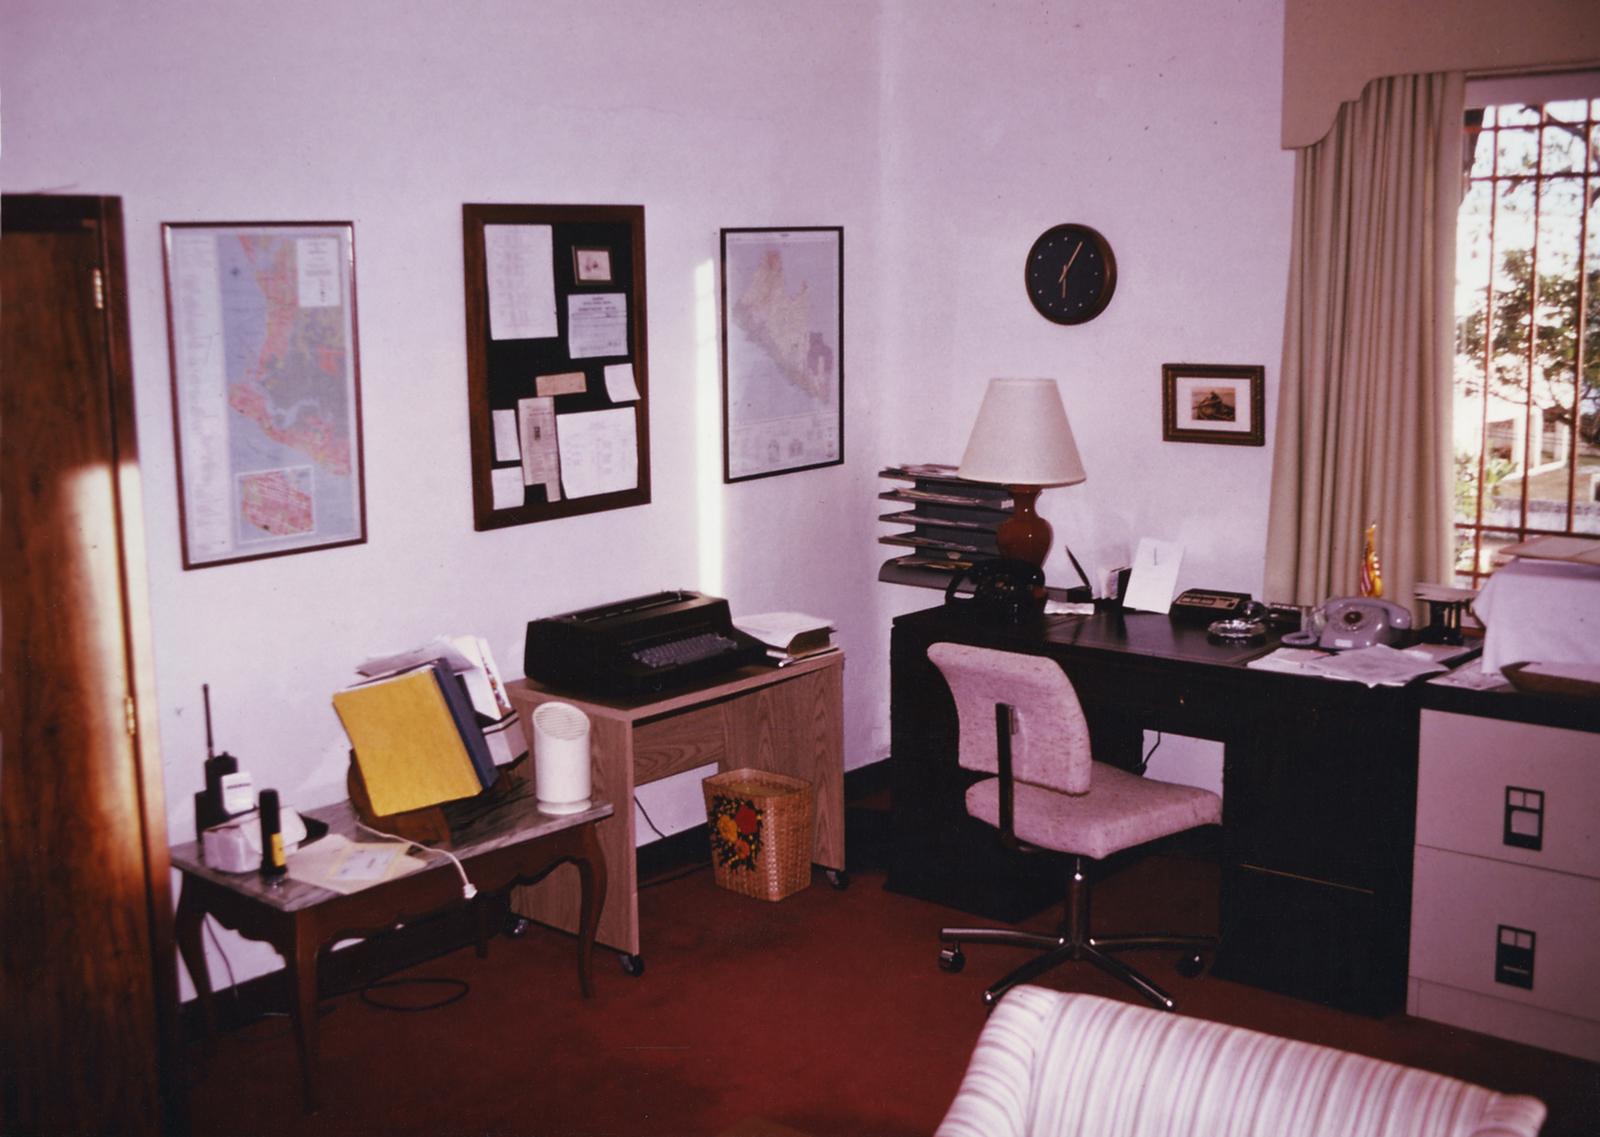 Monrovia - Deputy Chief of Mission Residence - 1984